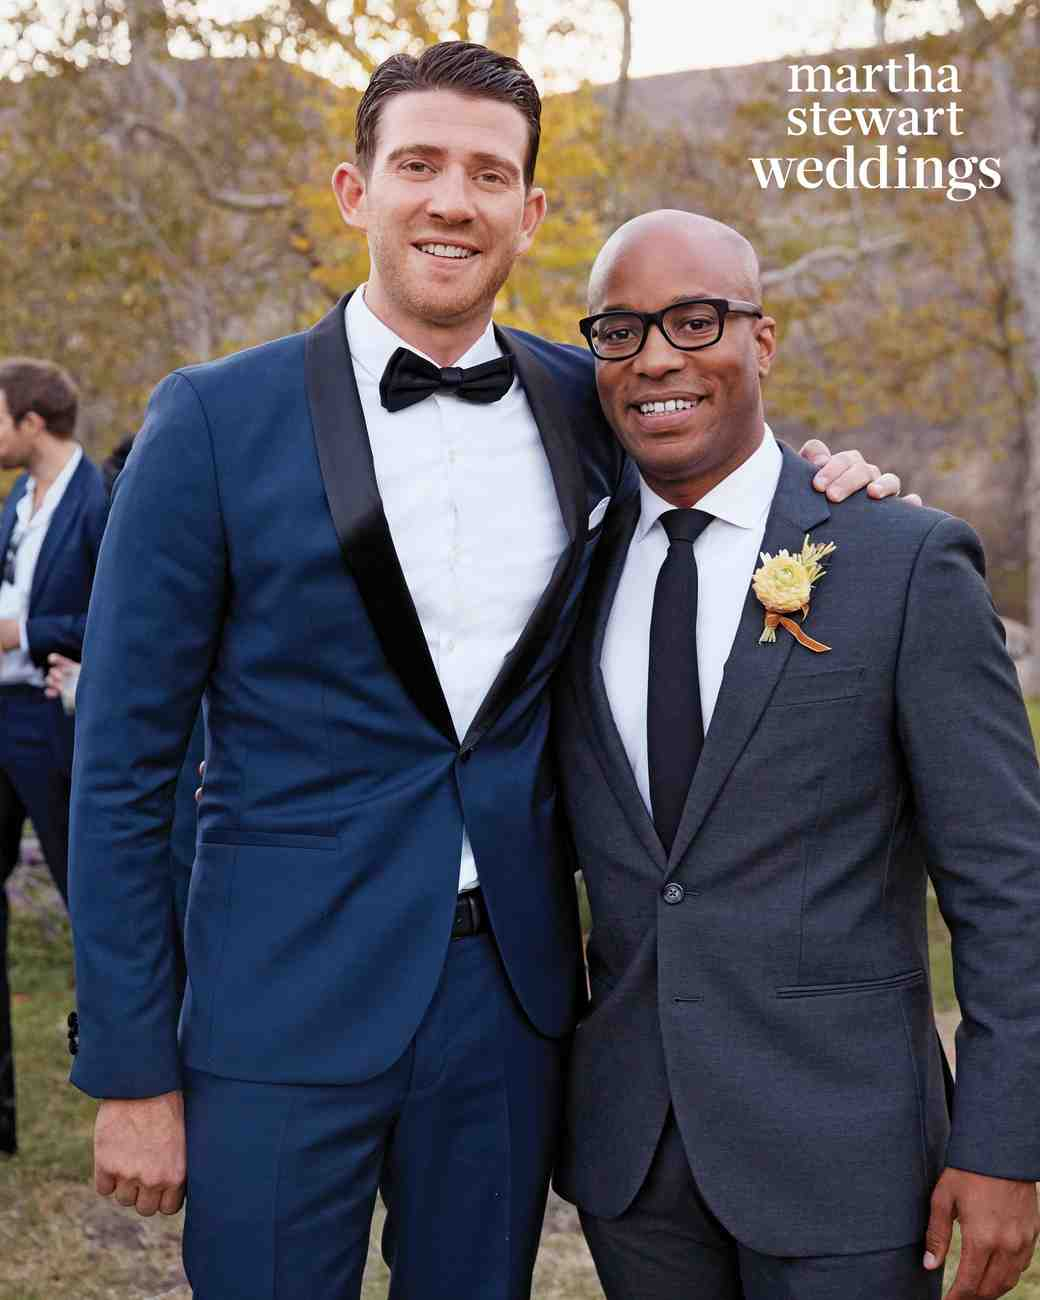 jamie-bryan-wedding-25-best-man-3554-d112664.jpg